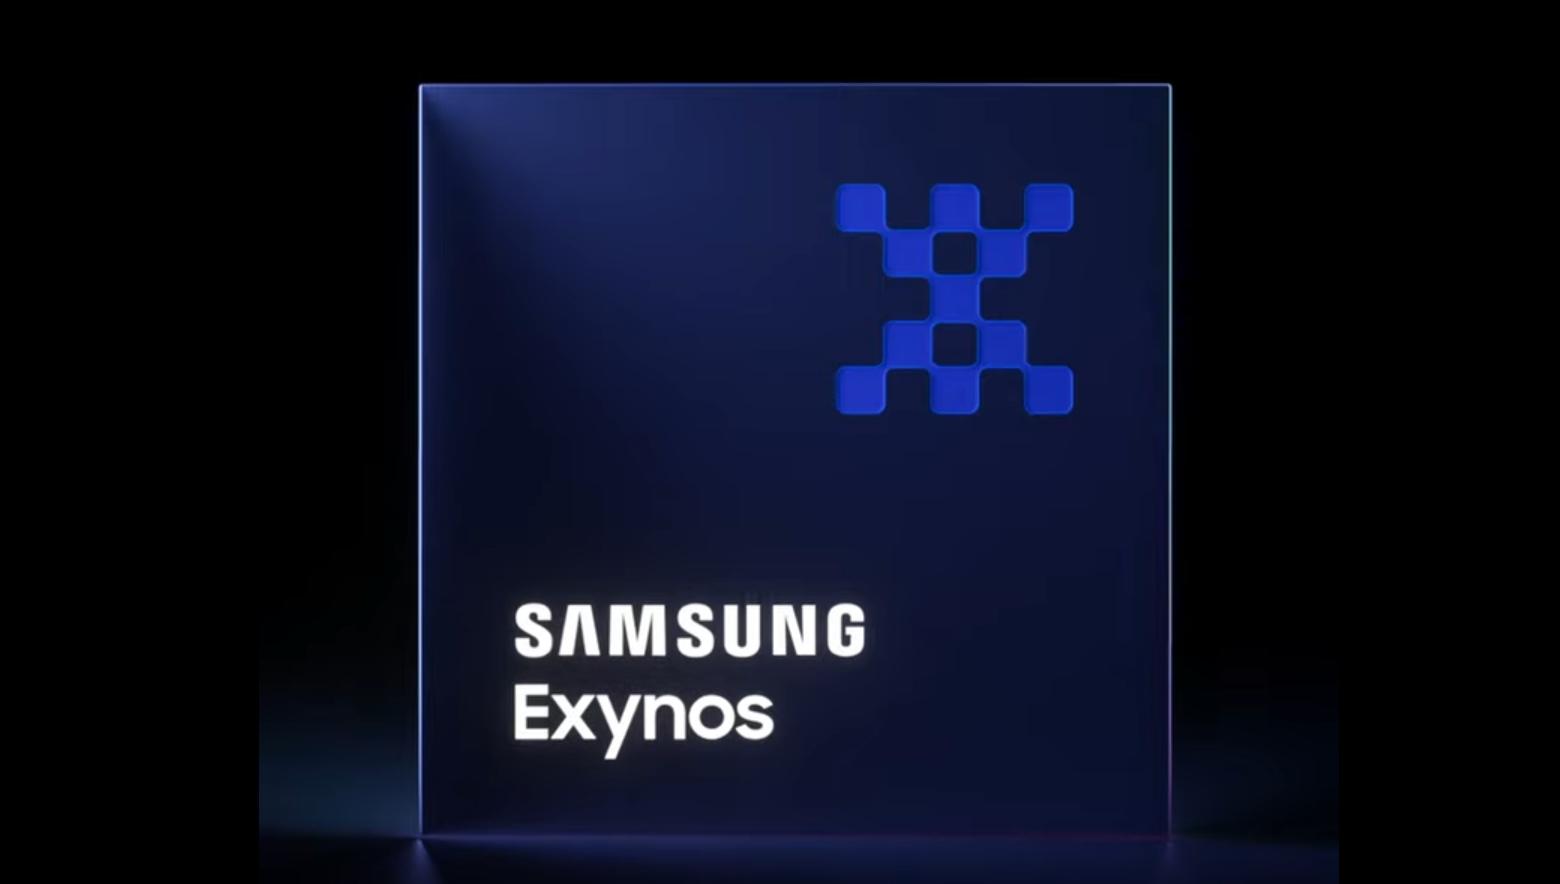 Samsung svela il SoC Exynos 2100